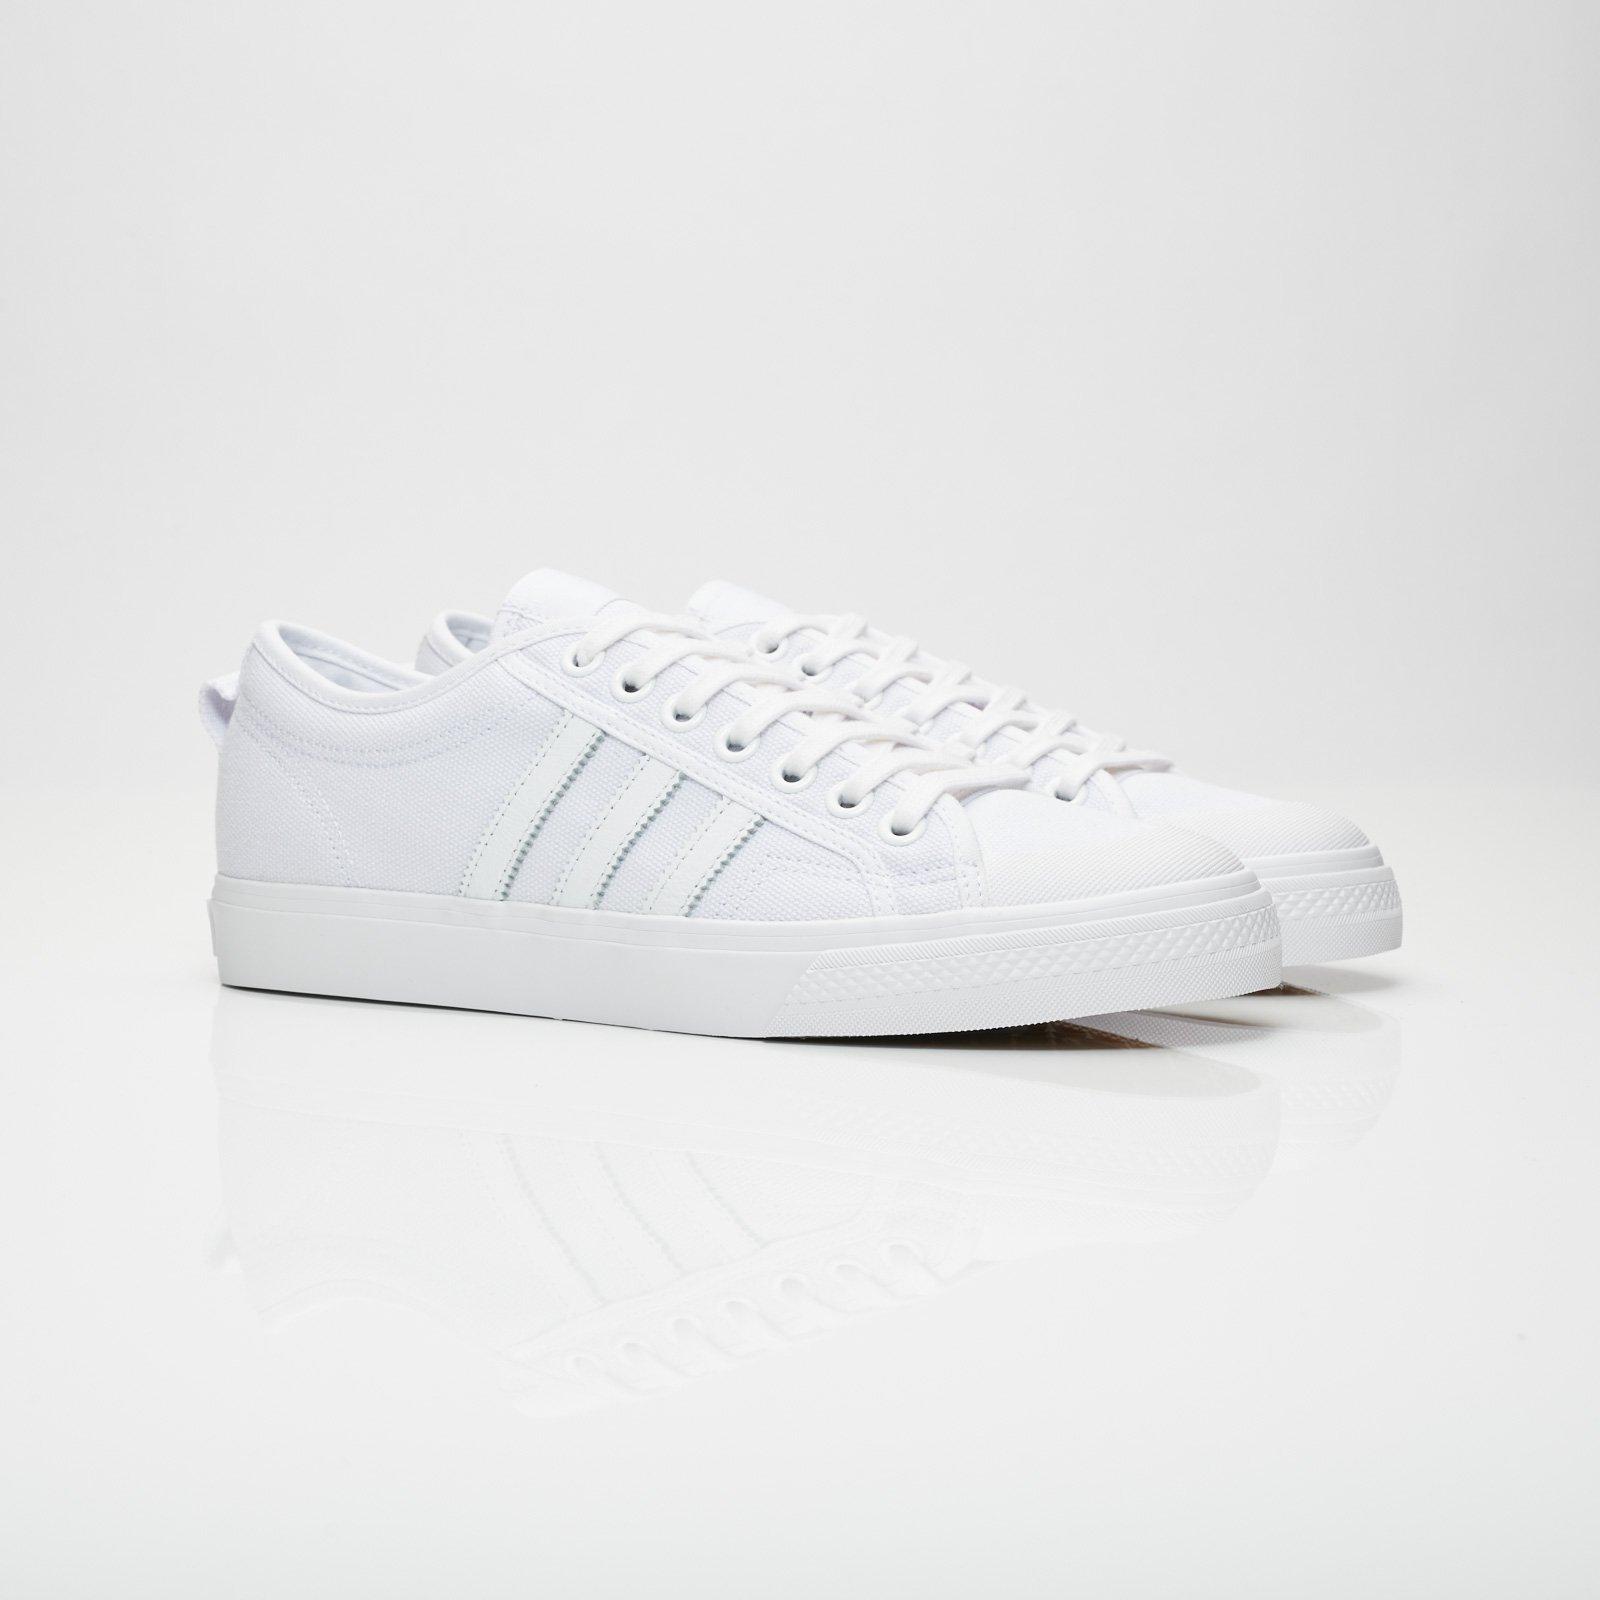 Nizza Sneakersamp; Streetwear Sneakersnstuff I Adidas Bz0496 Low VGqzMpSU